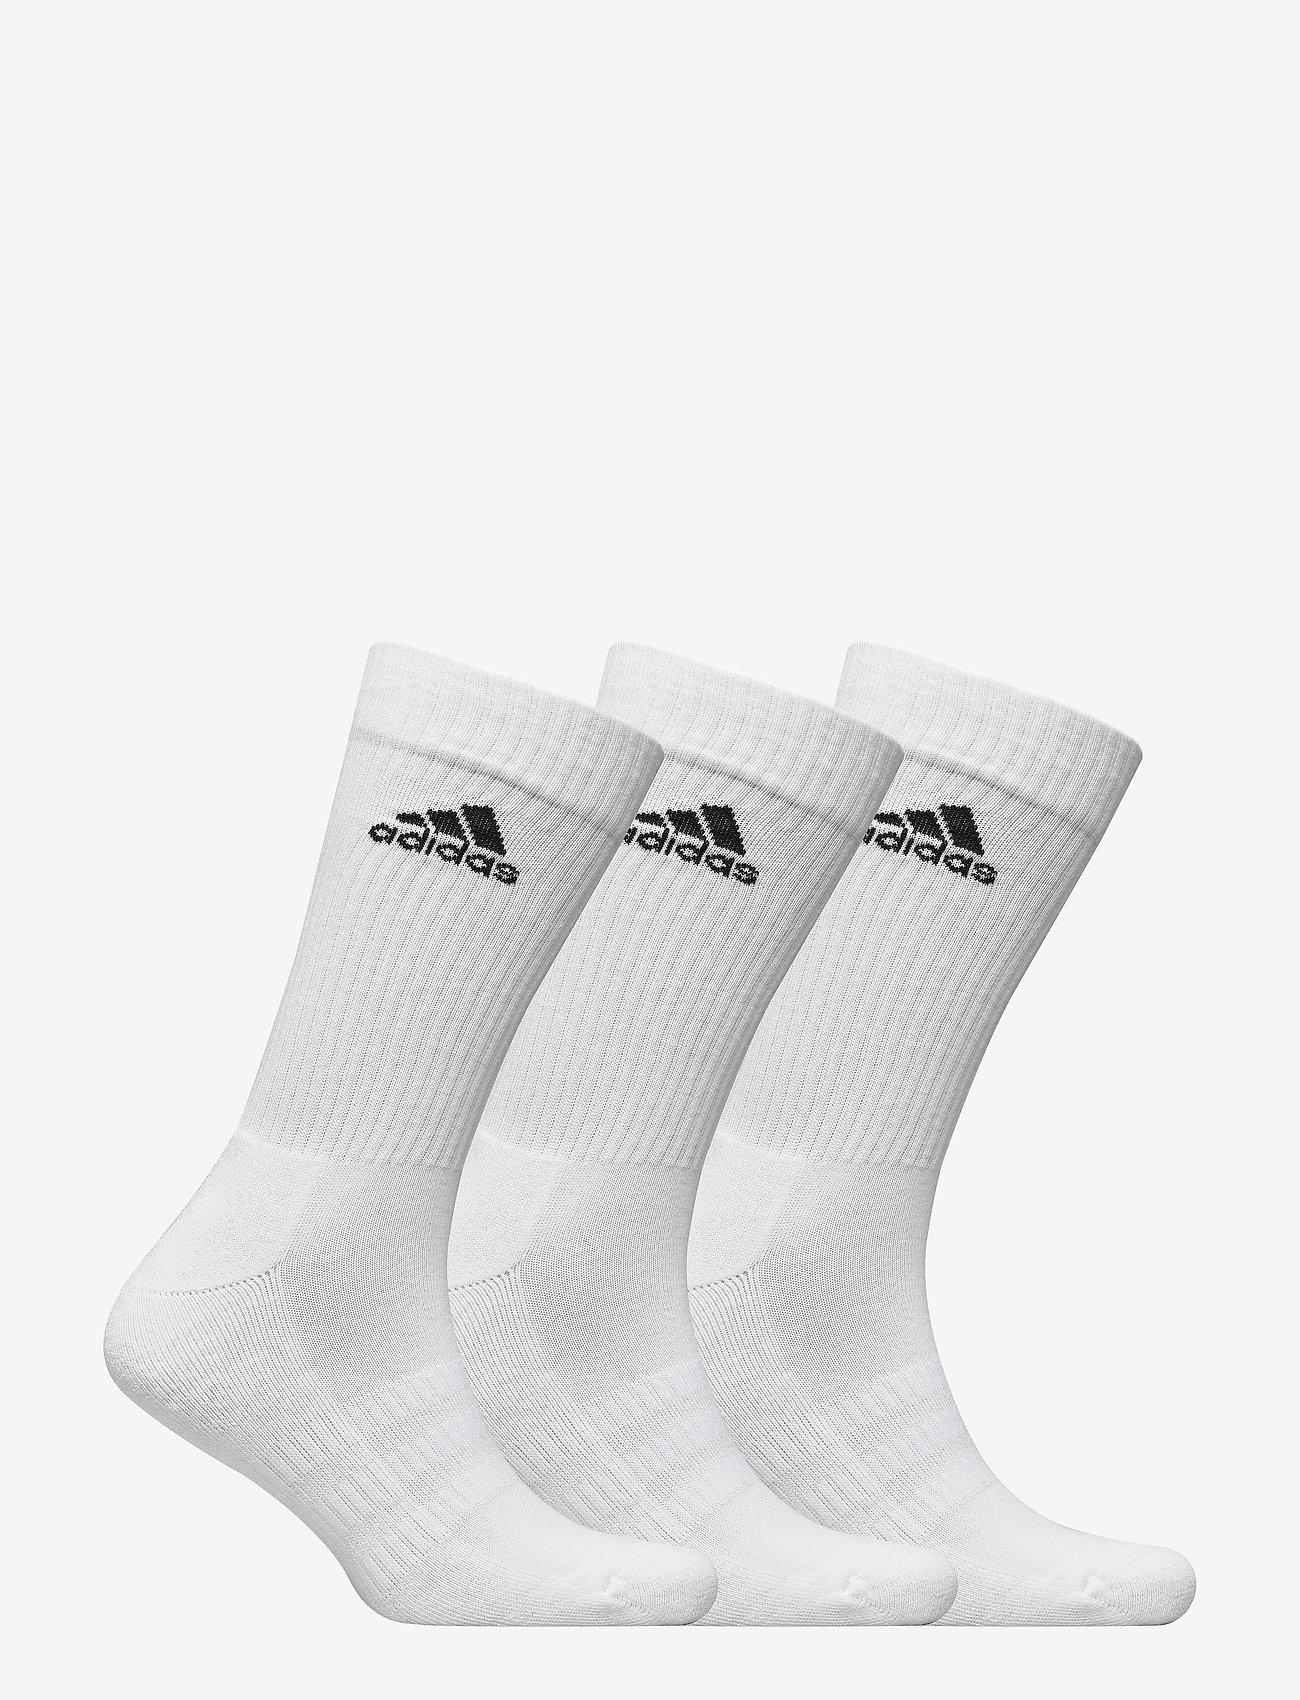 Cush Crw 3pp (White/white/black) - adidas Performance OxhHp7